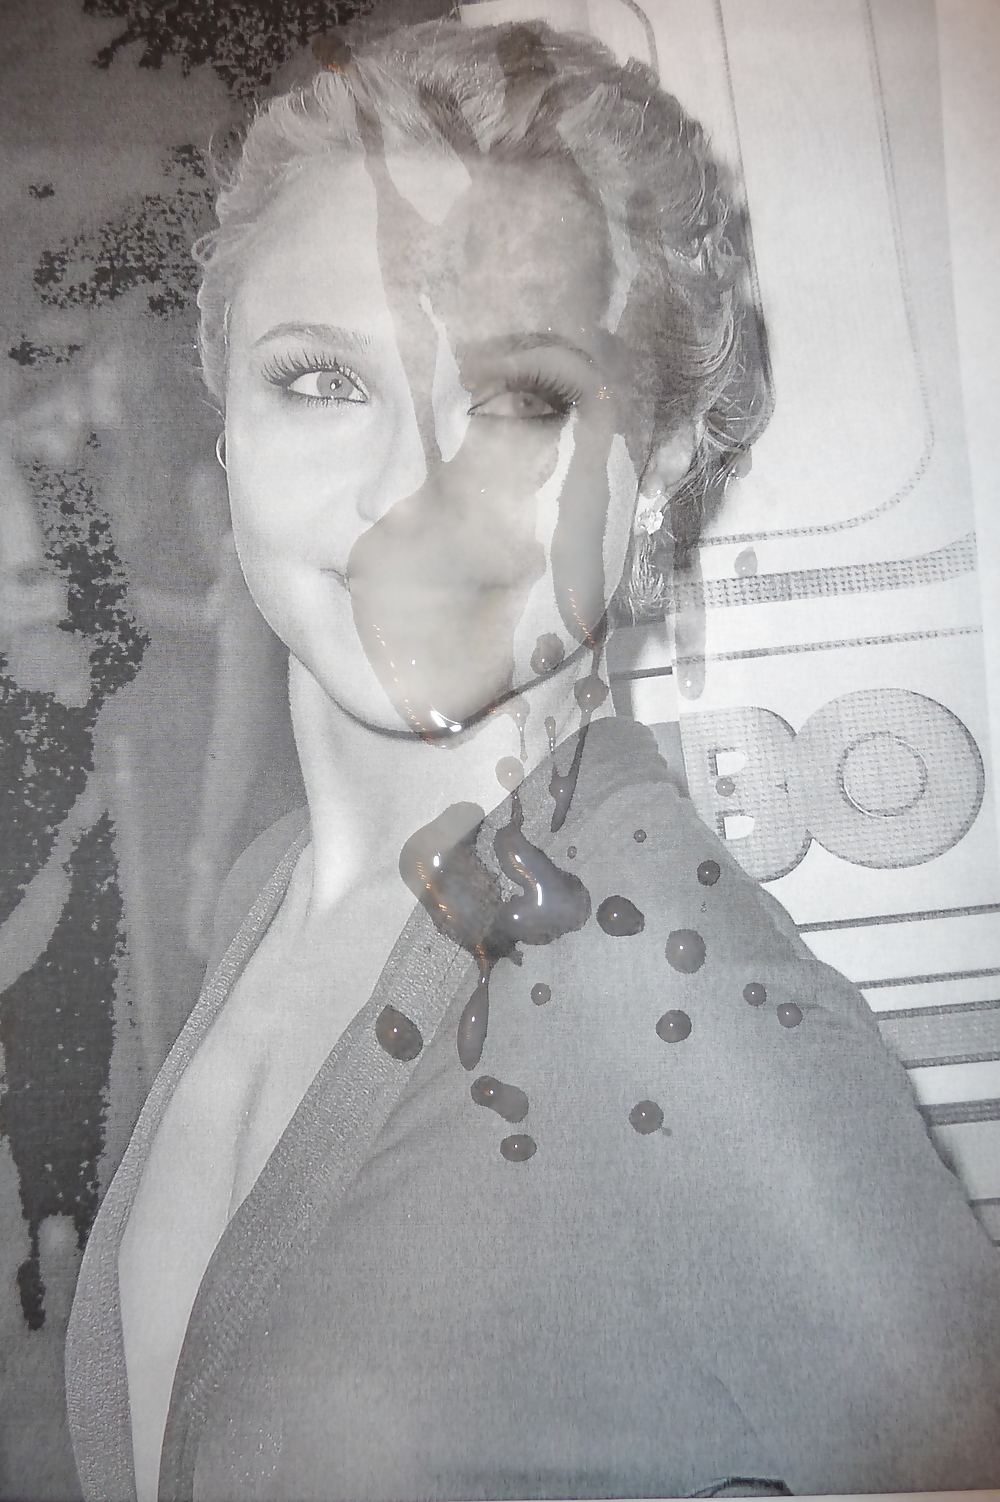 covered sperm in panettiere Hayden